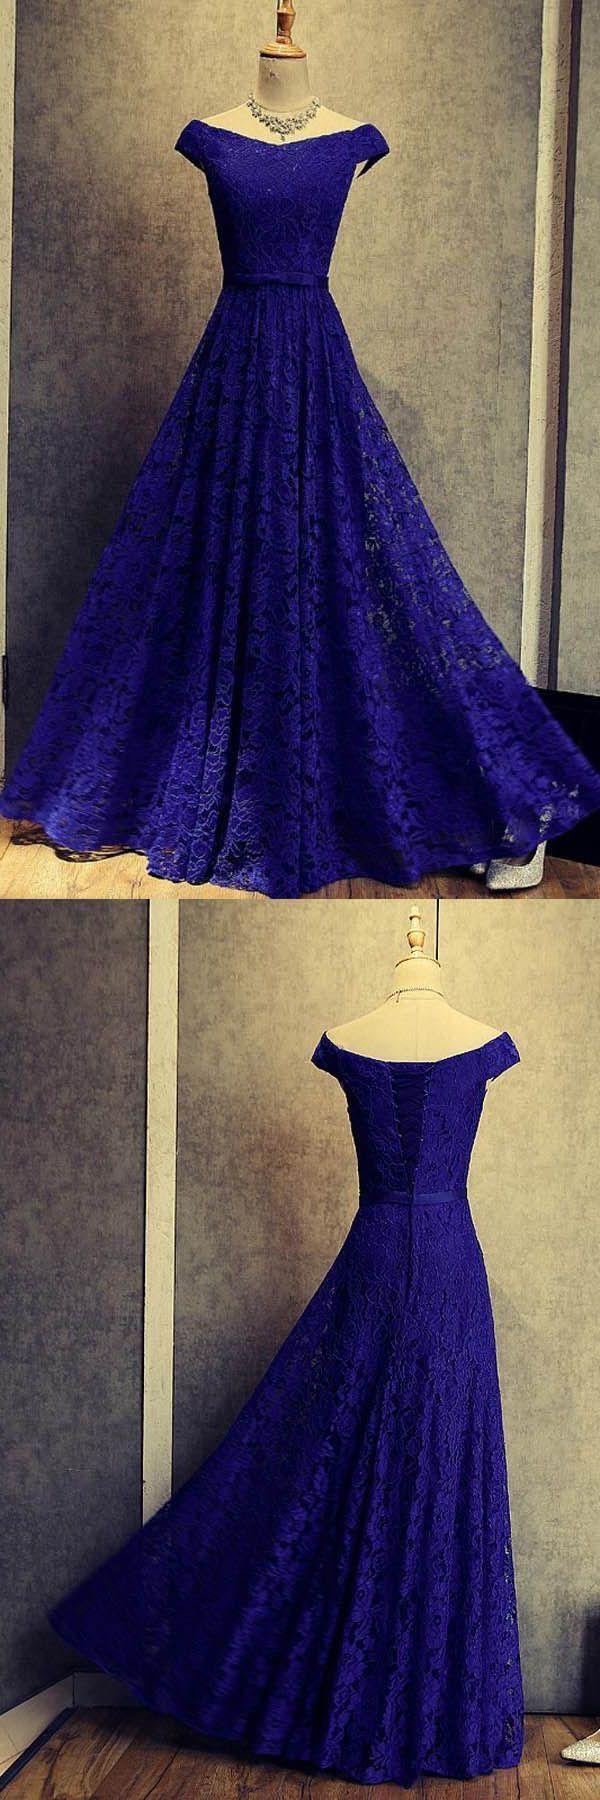 , Royal Blue  Dresses, Lace Prom Dresses, Lace Prom Dresses 2018, Blue Prom Dresses,